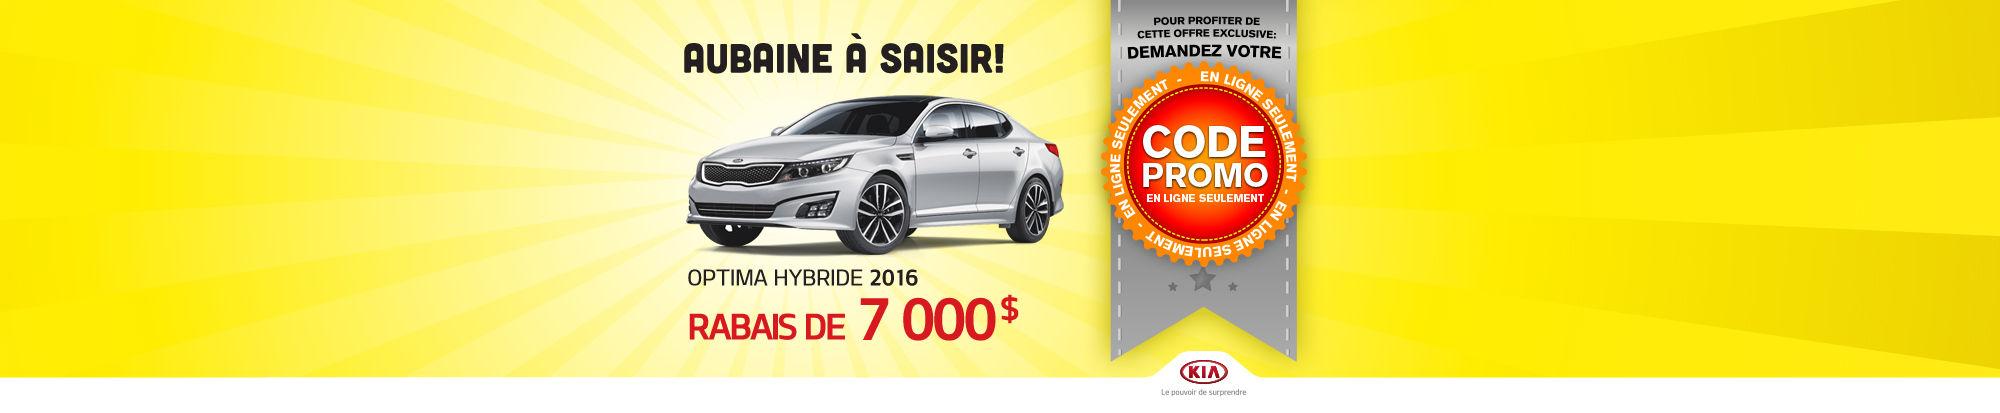 Code promo - Kia Optima Hybride 2015